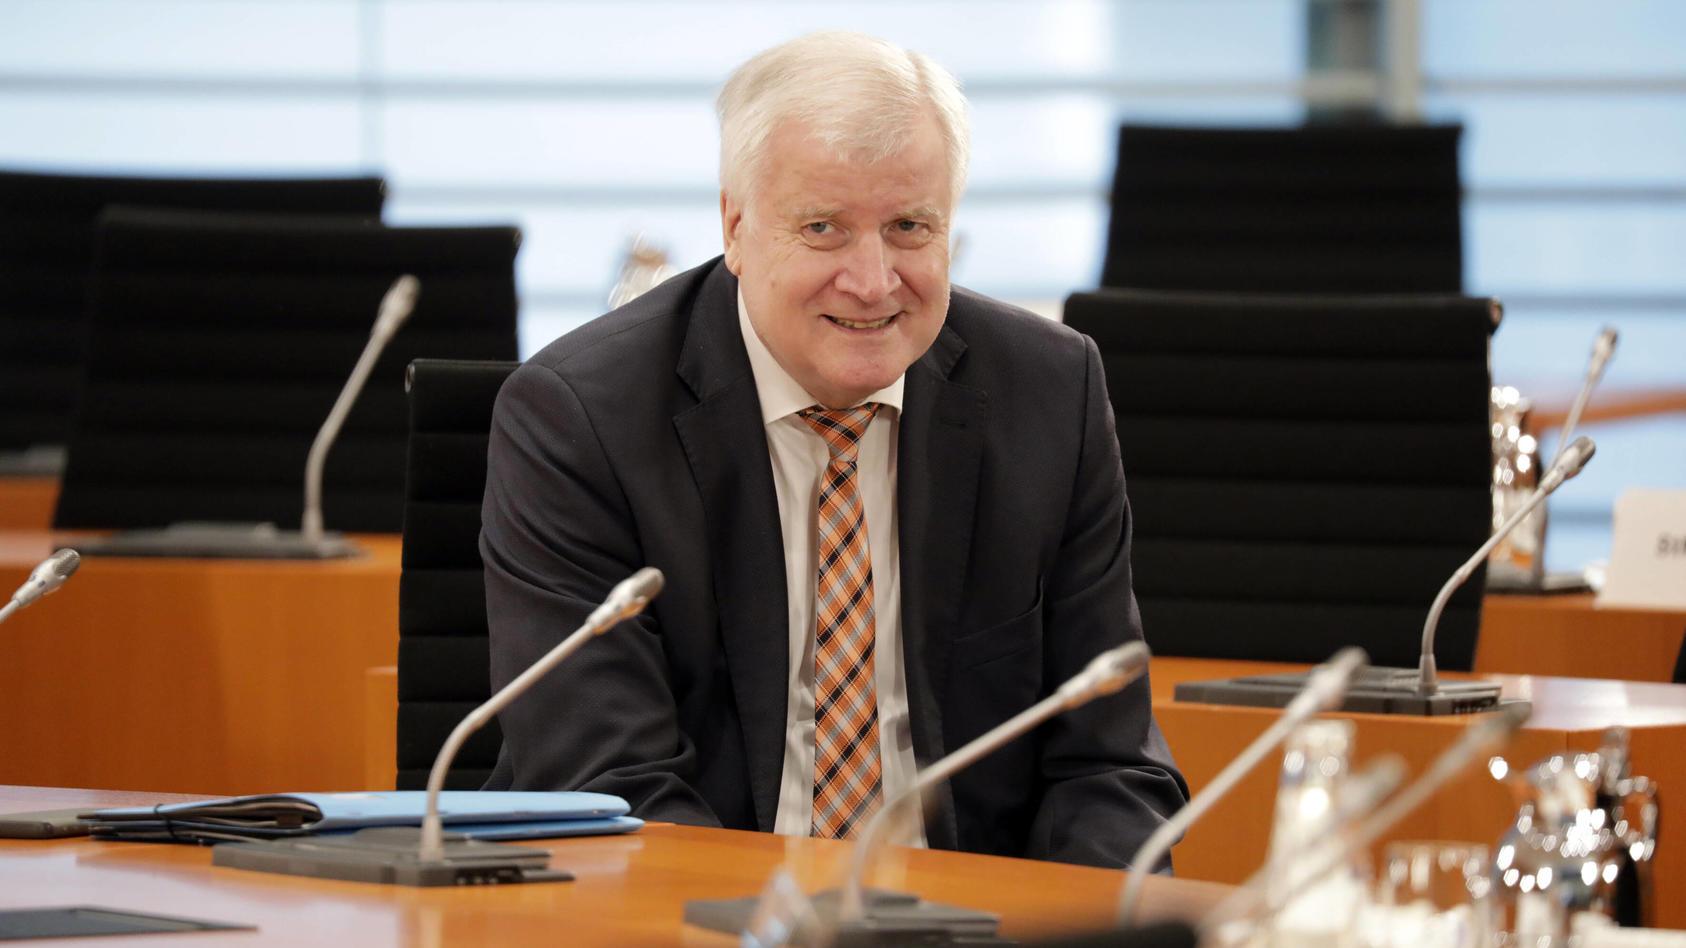 Horst Seehofer, Bundesminister des Innern fuer Bau und Heimat, CDU, Kabinettsitzung, DEU, Berlin, 20.05.2020 *** Horst S